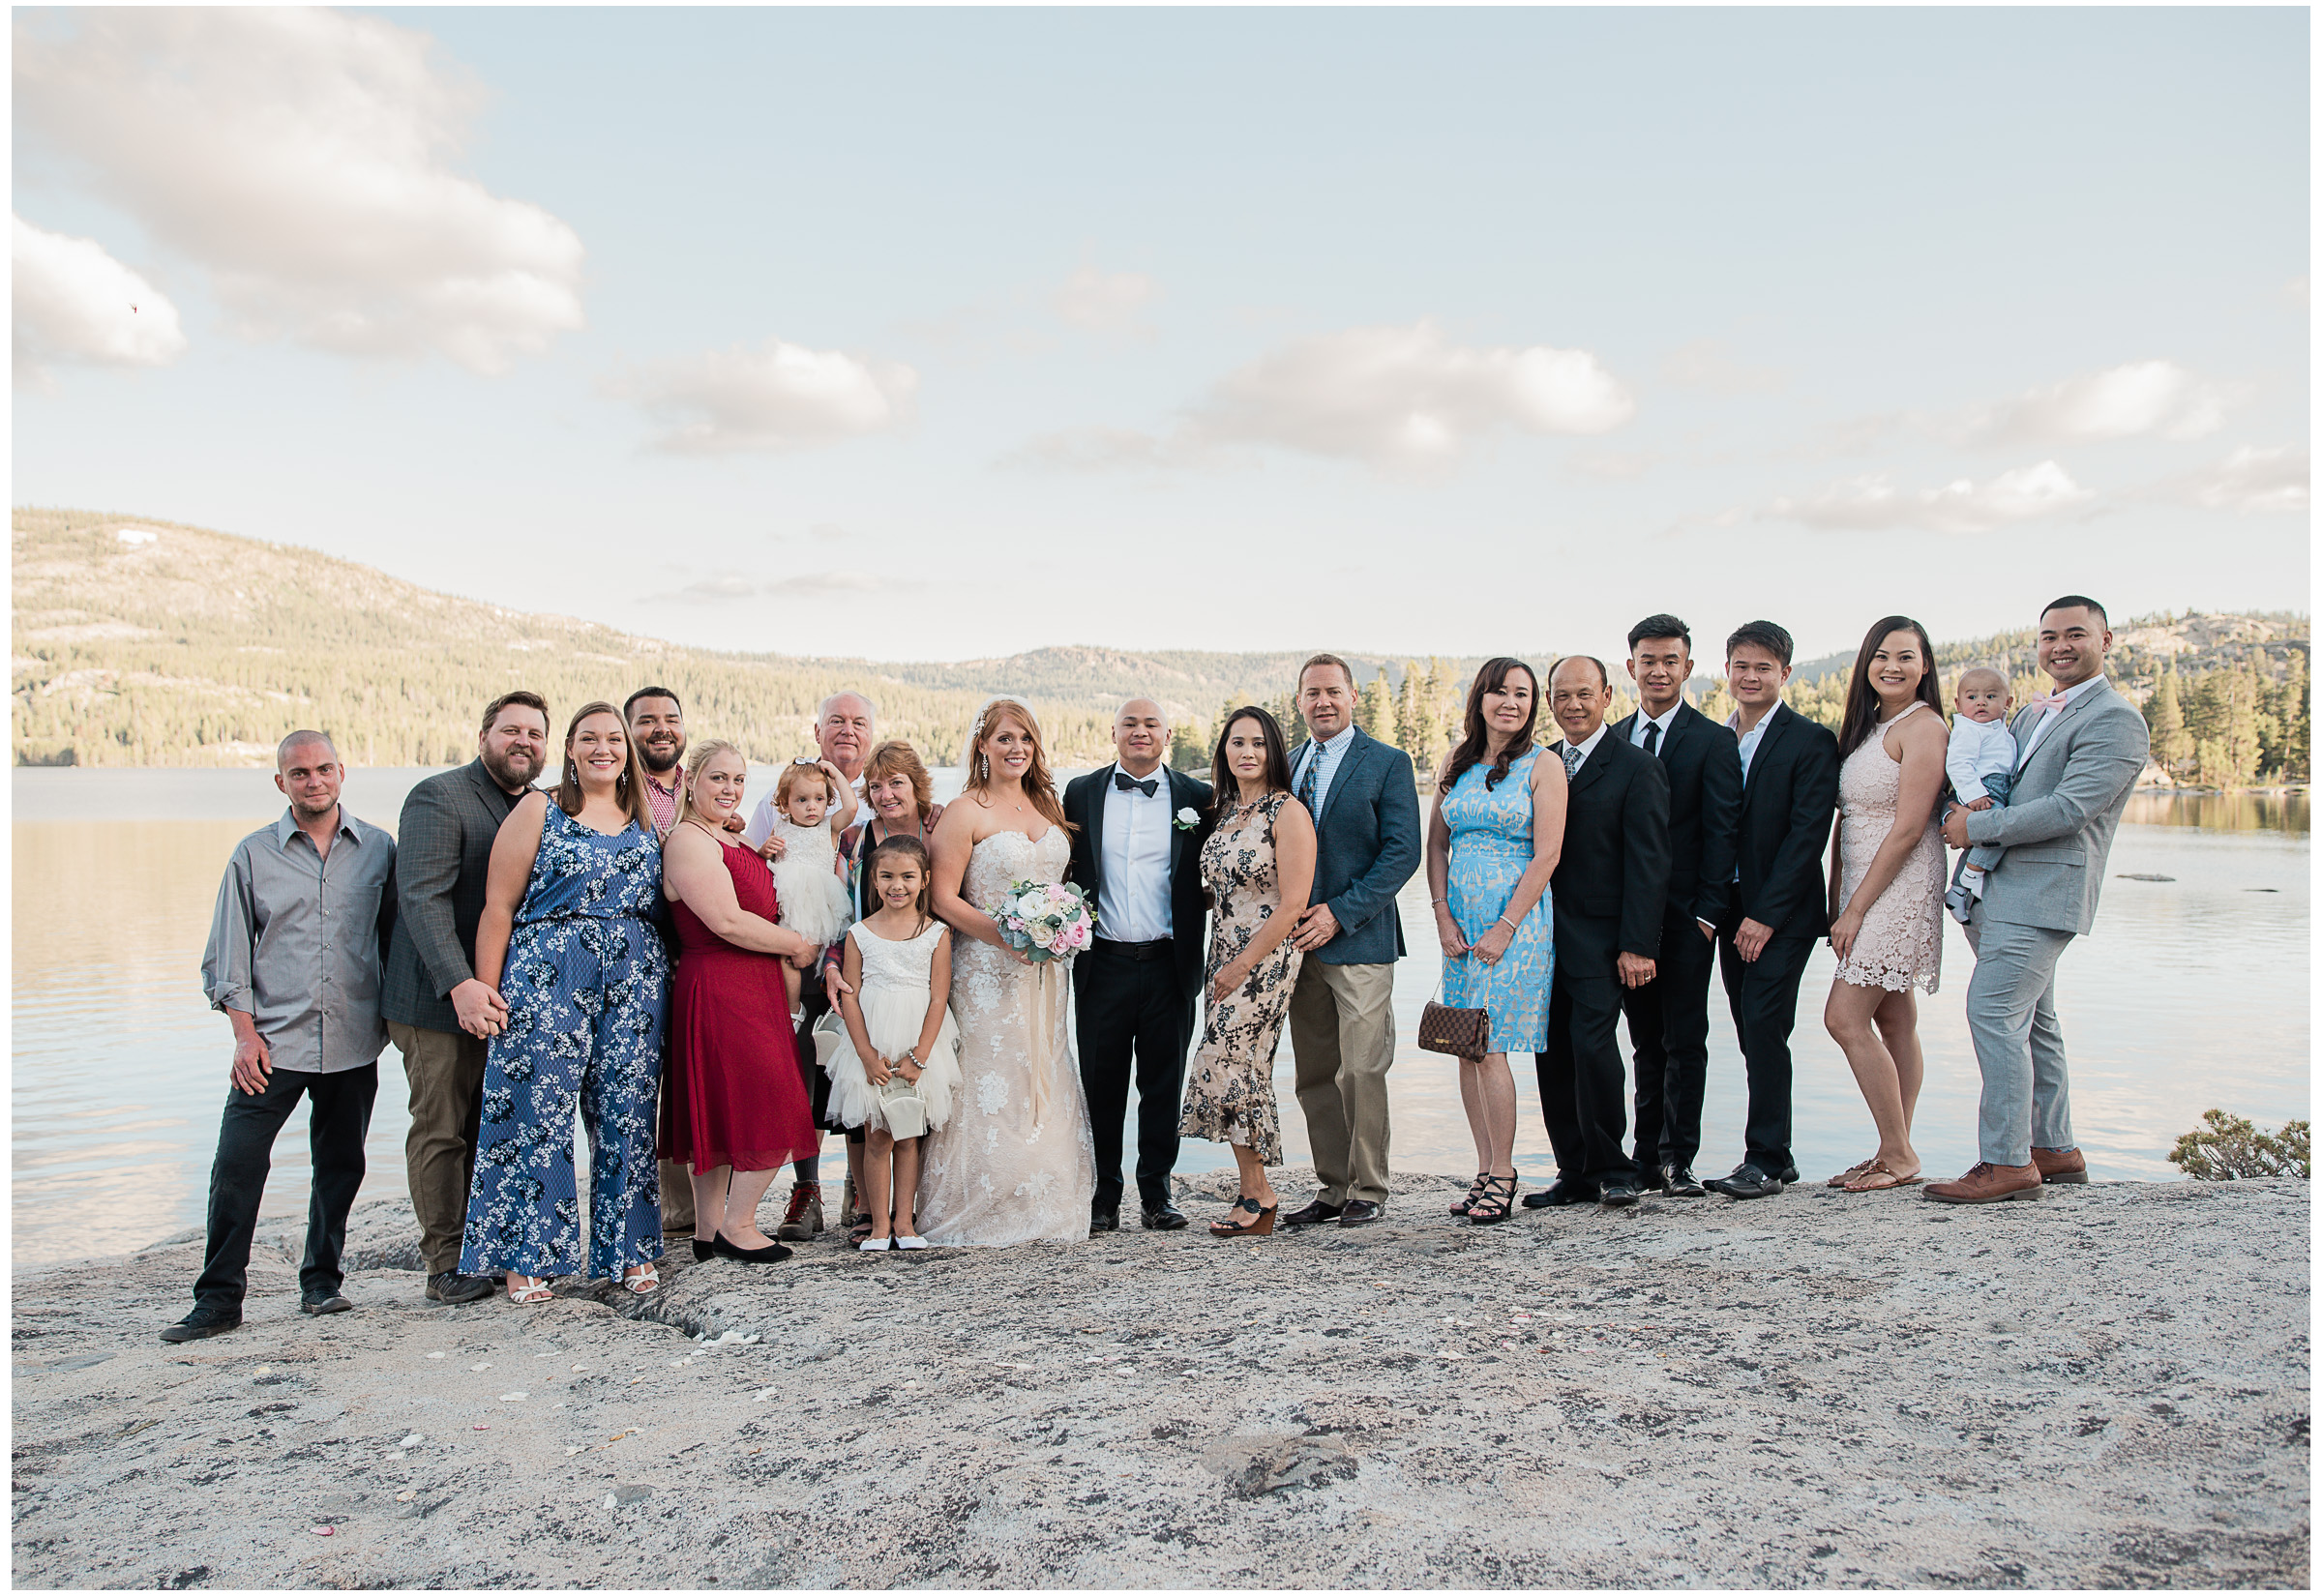 Clarksburg Wedding - Sacramento Photographer - Bogle Winery - Justin Wilcox Photography - 10.jpg